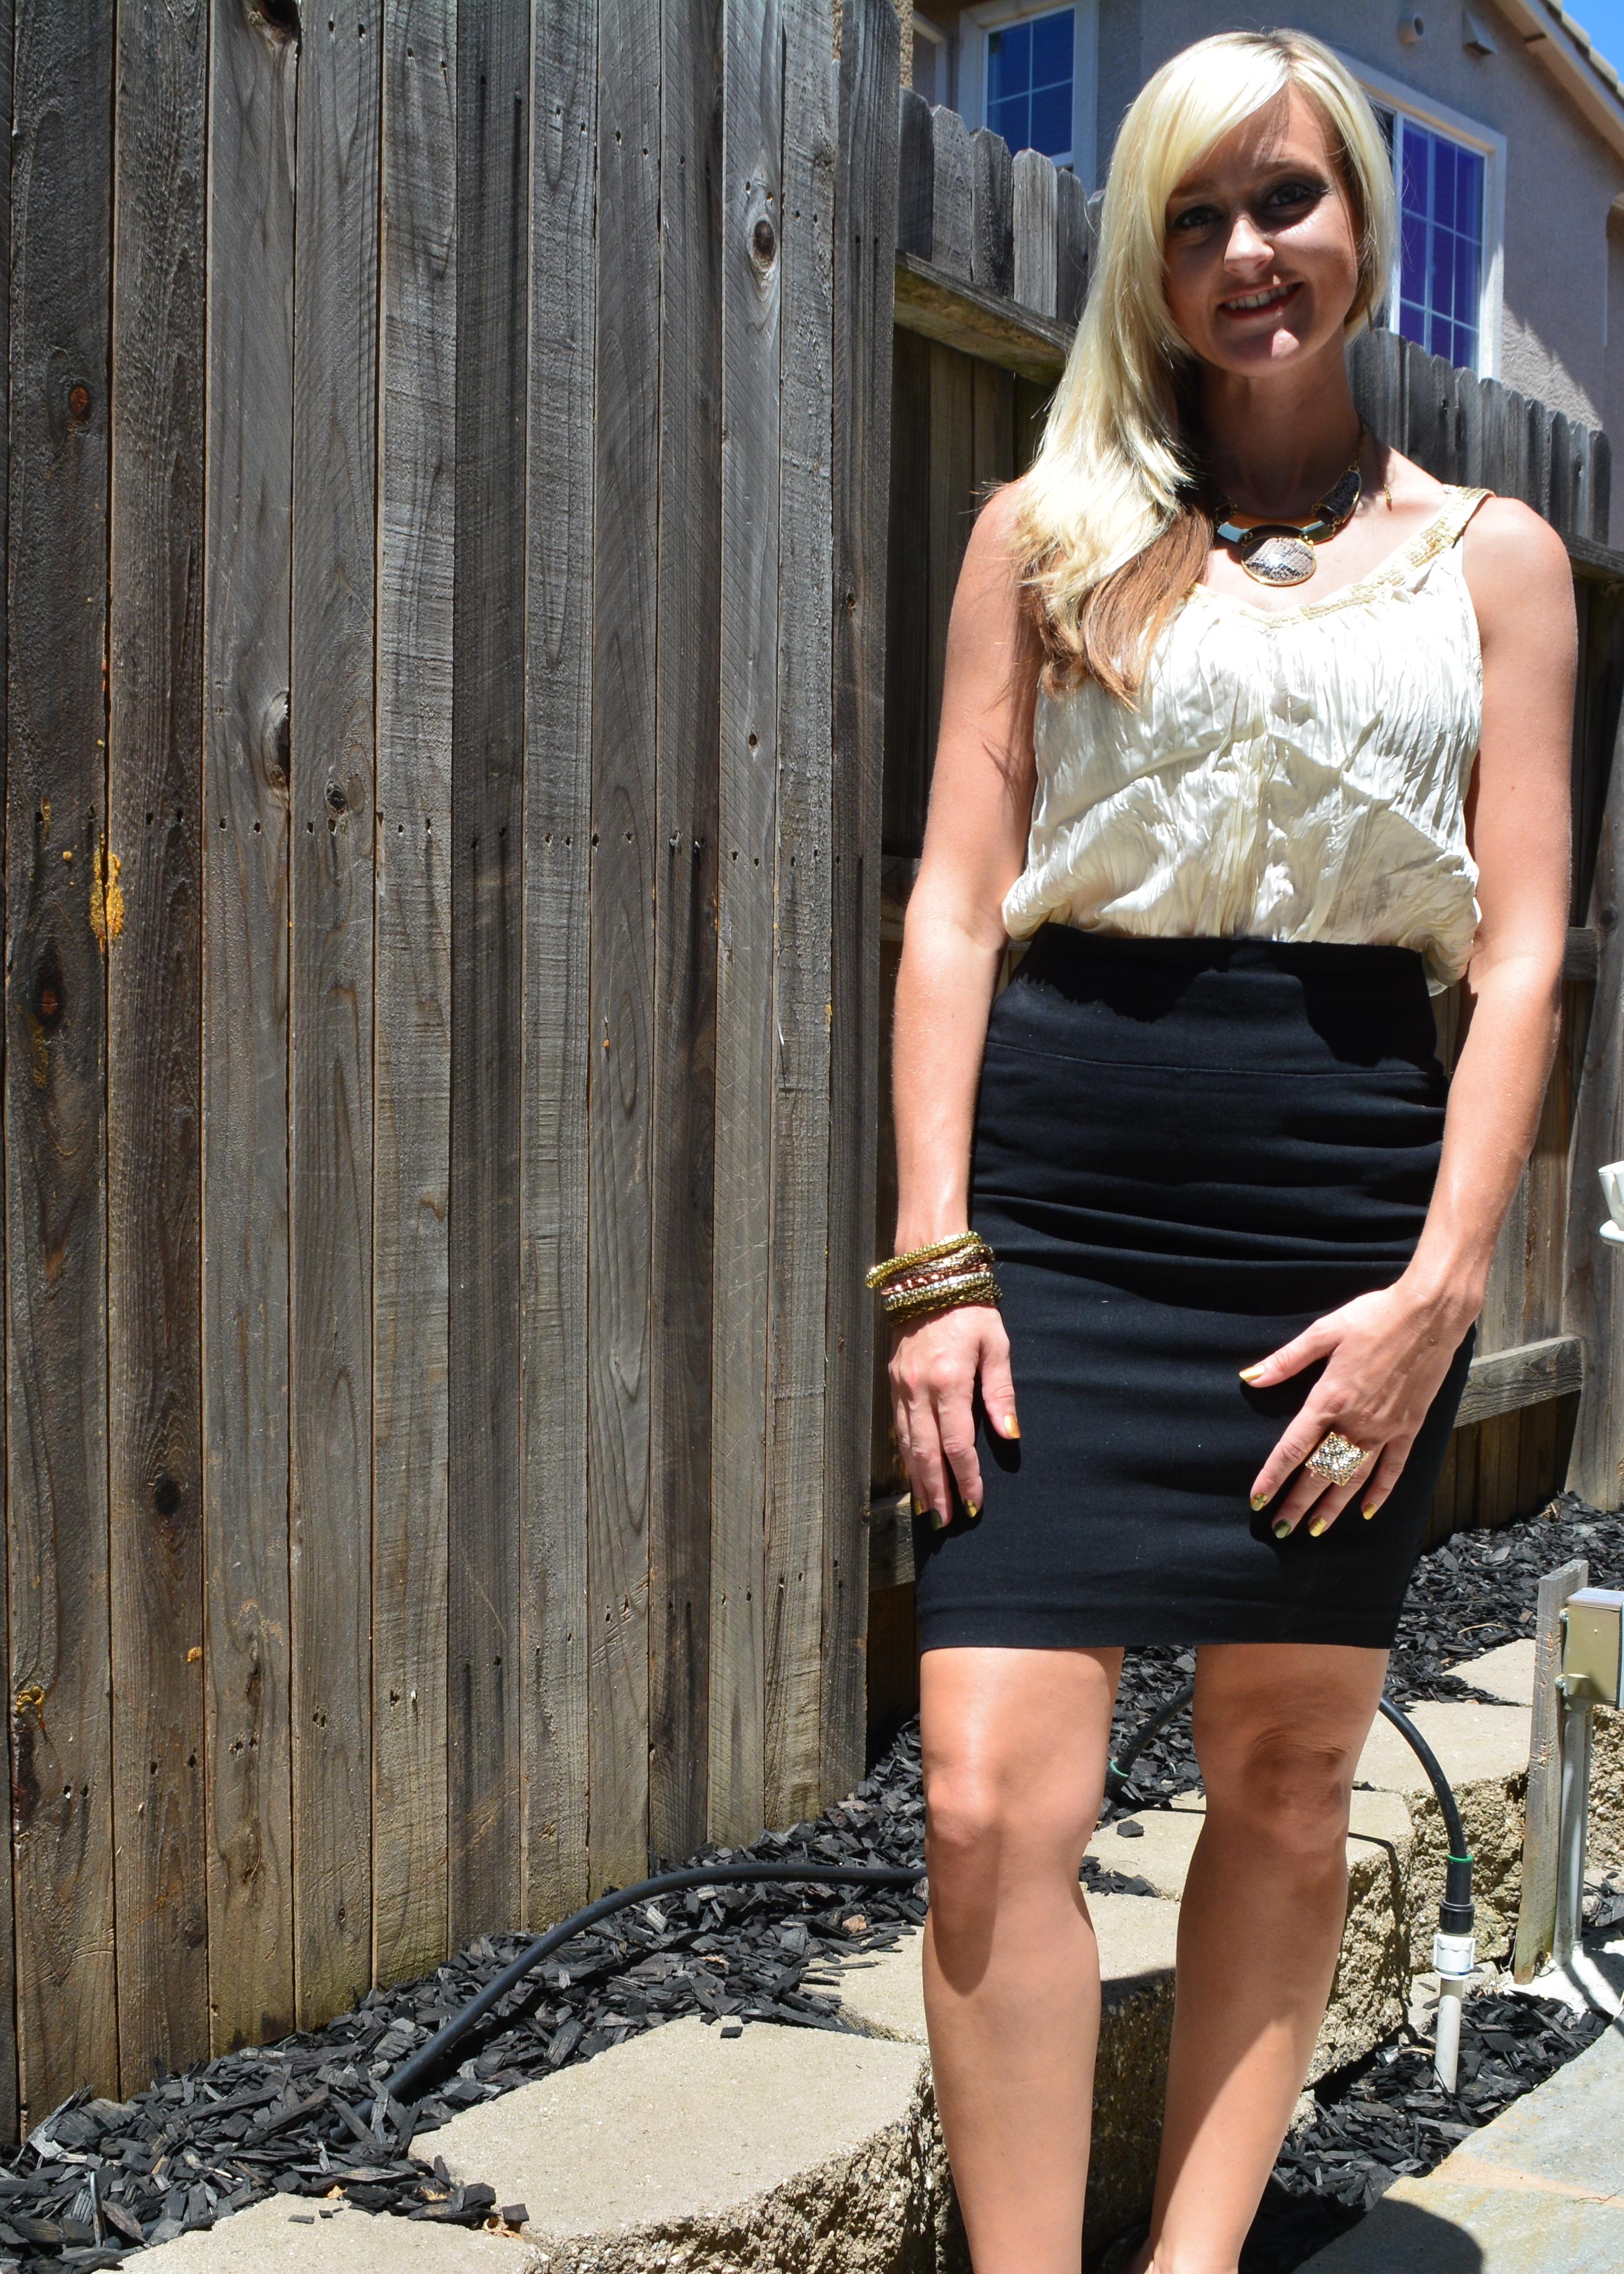 Sheer Blouse + Pencil Skirt = #workinggirlwardrobe